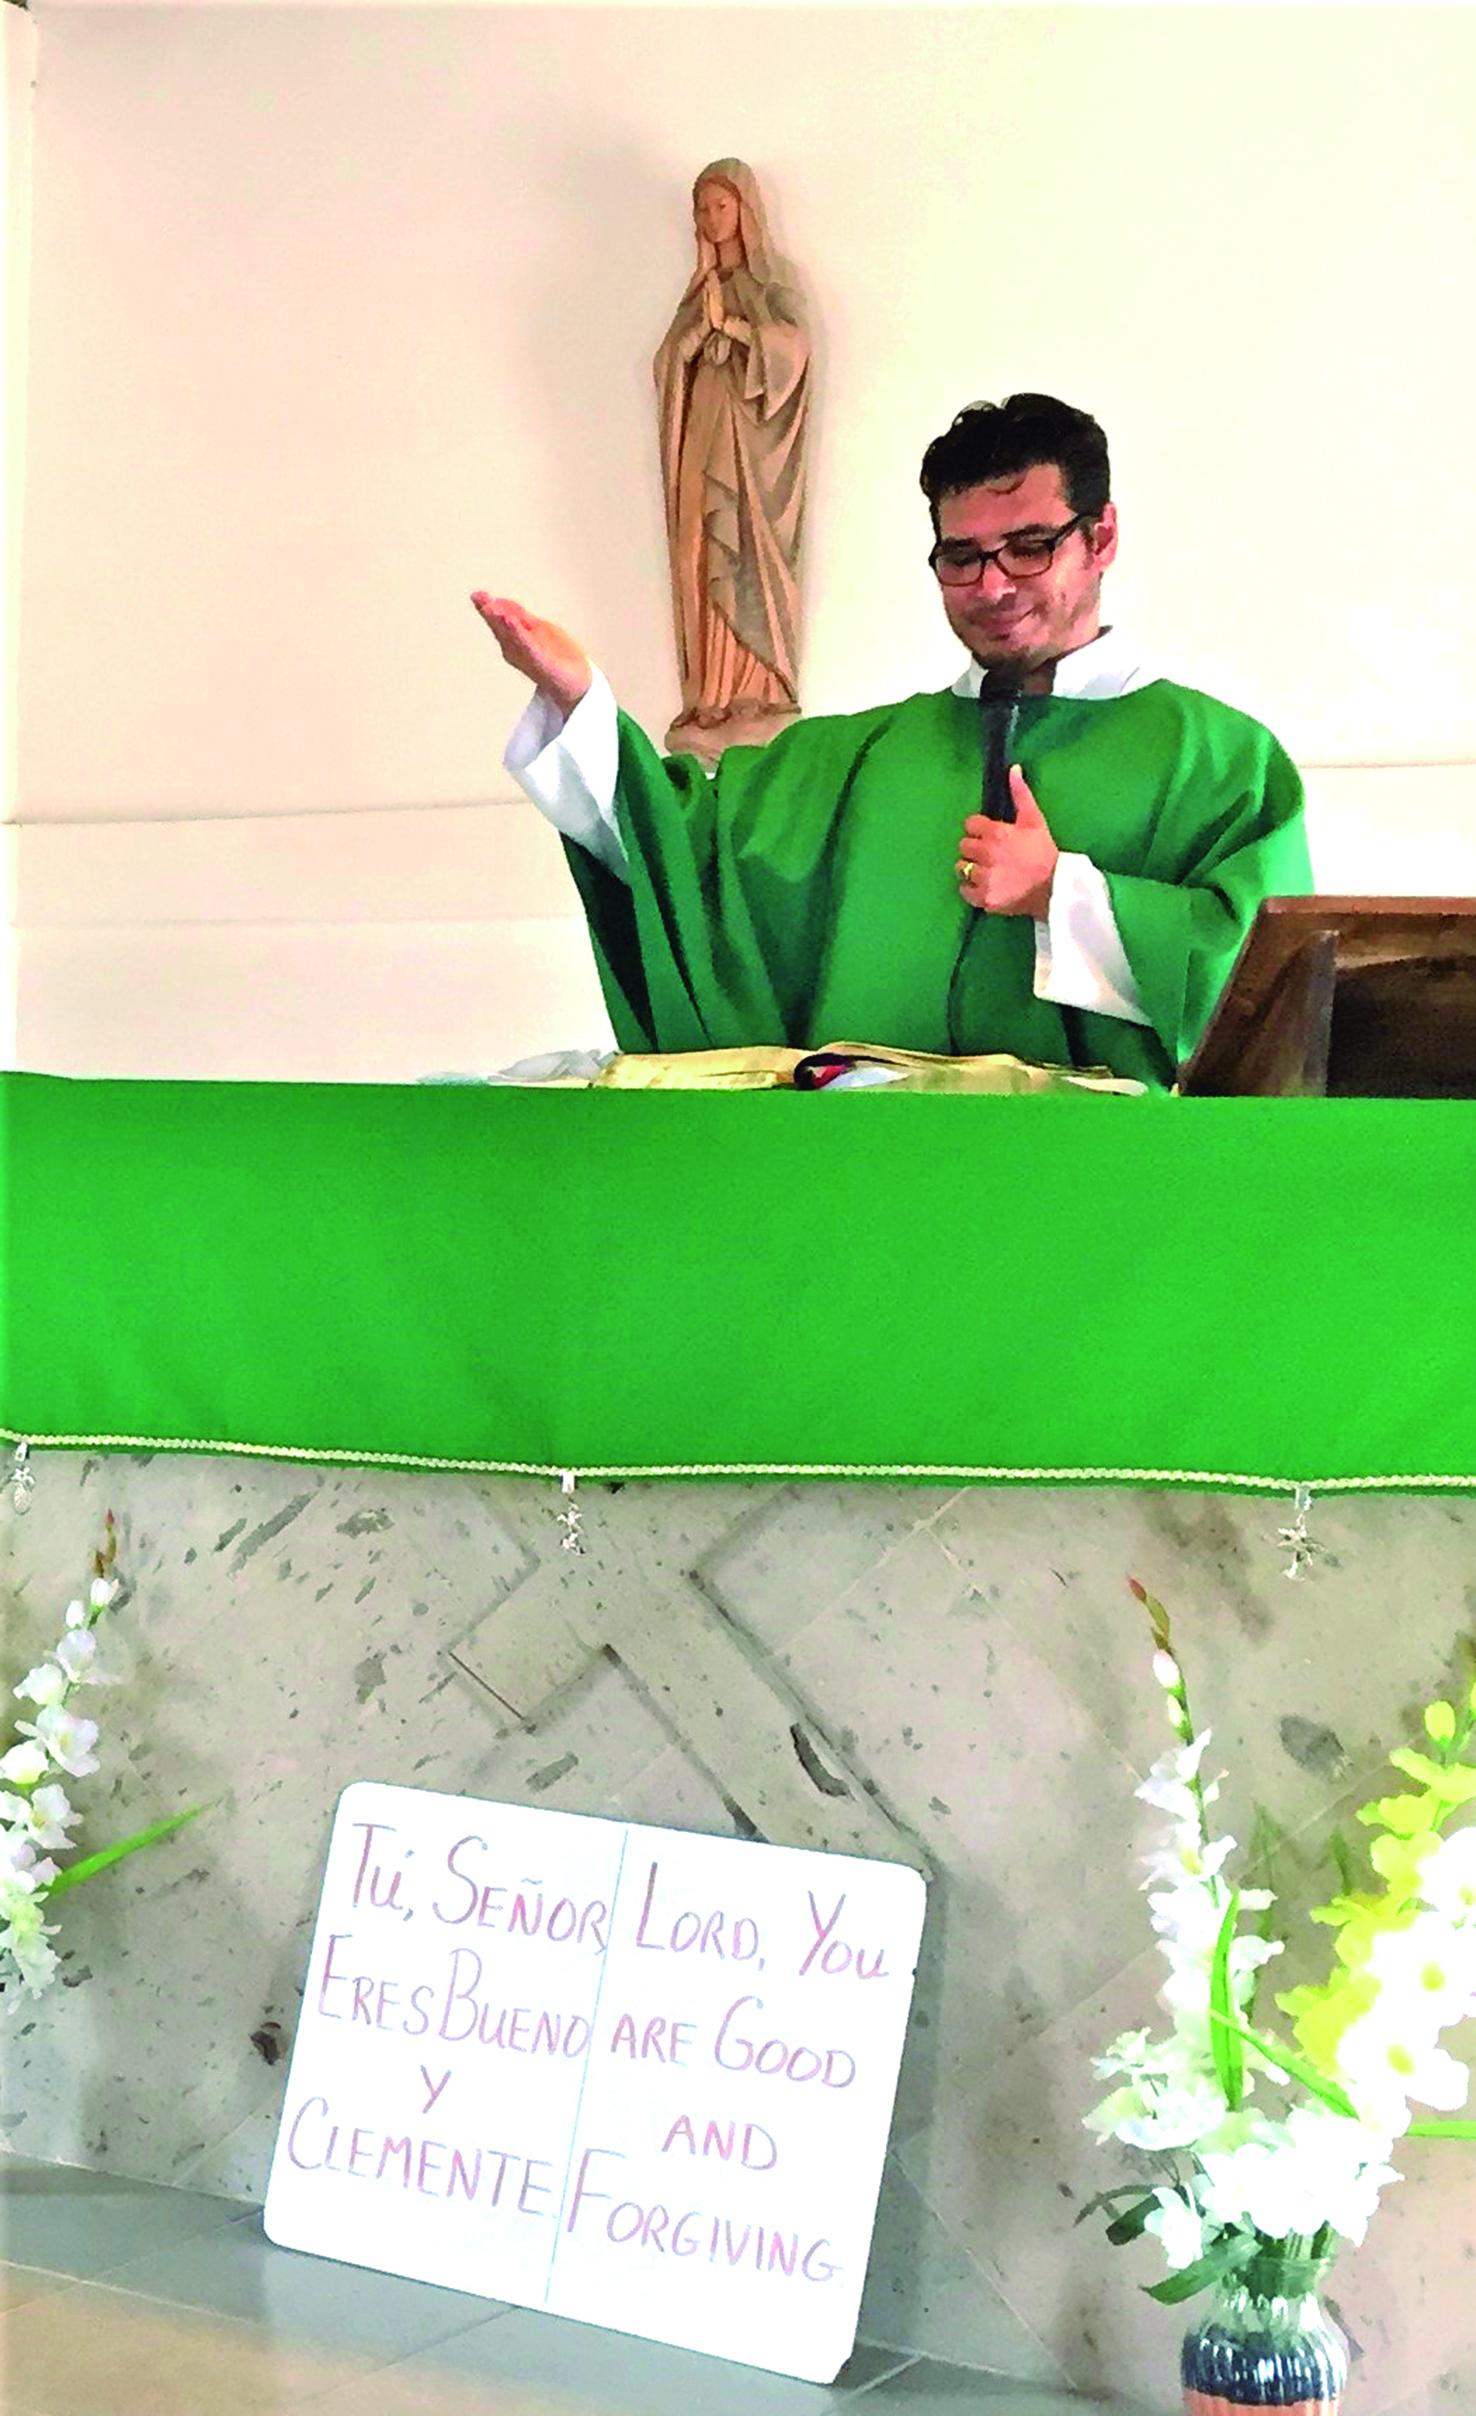 St. Joseph's new priest is an old friend